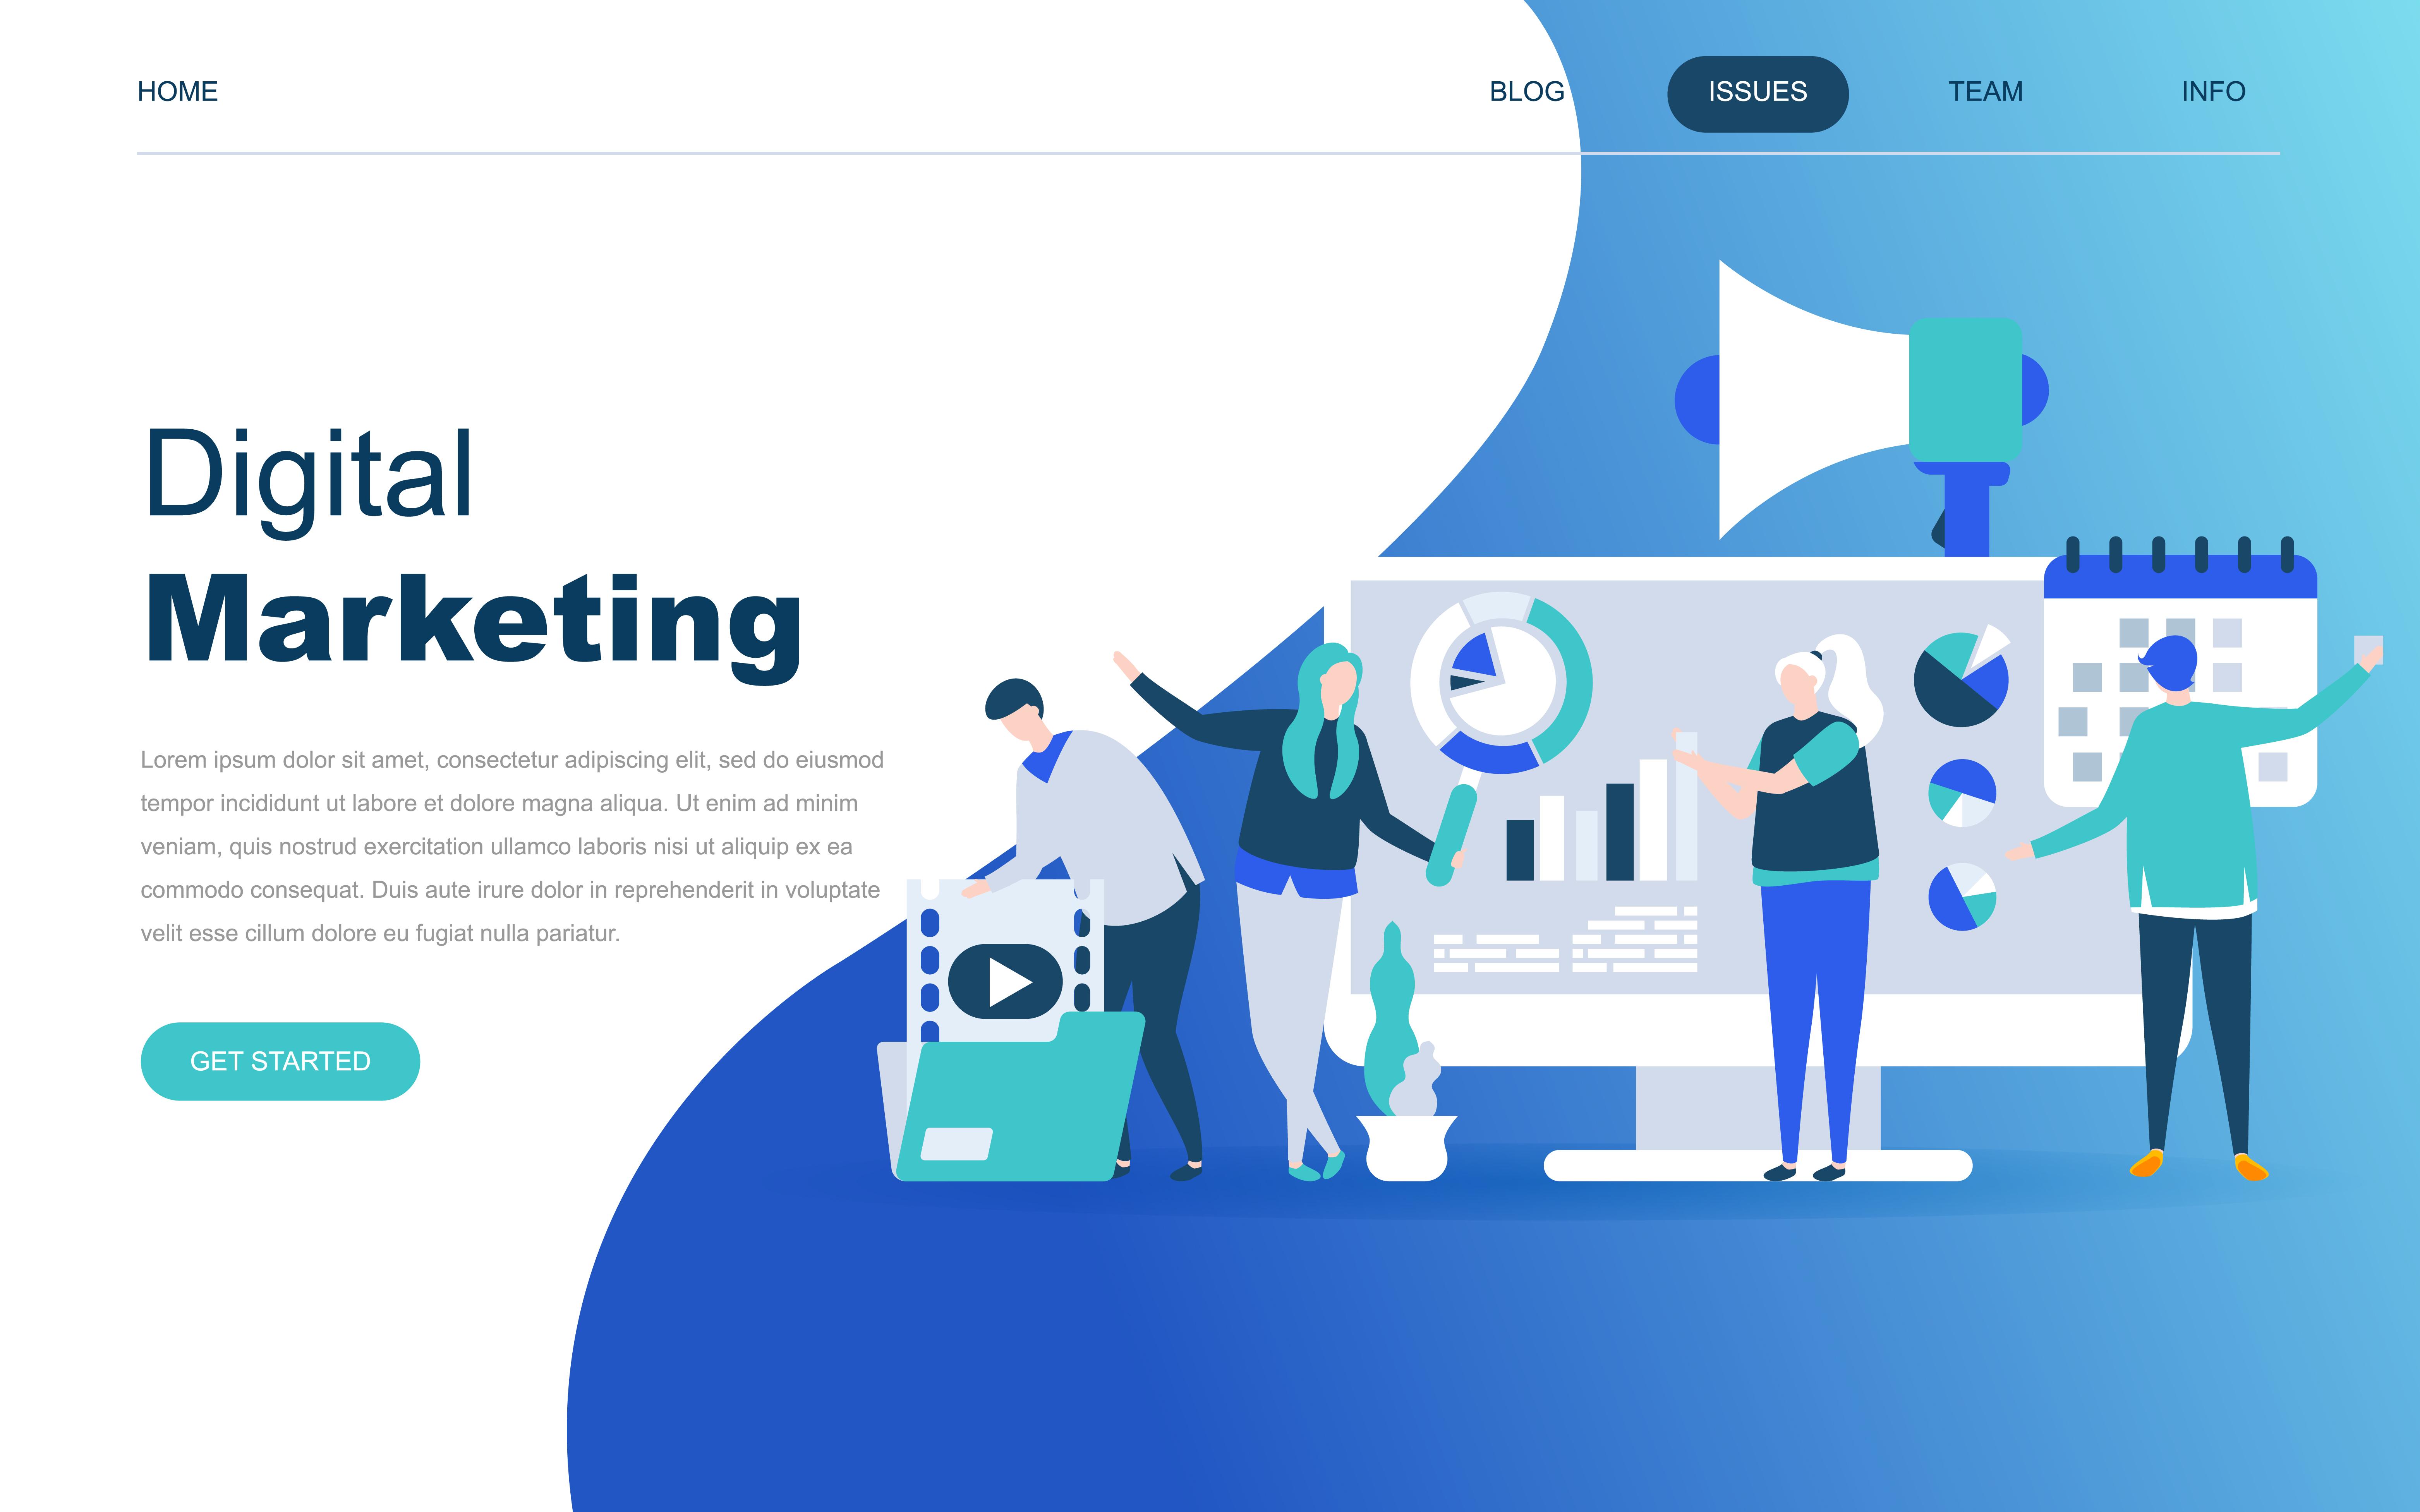 Vector Illustration Web Designs: Modern Flat Design Concept Of Digital Marketing